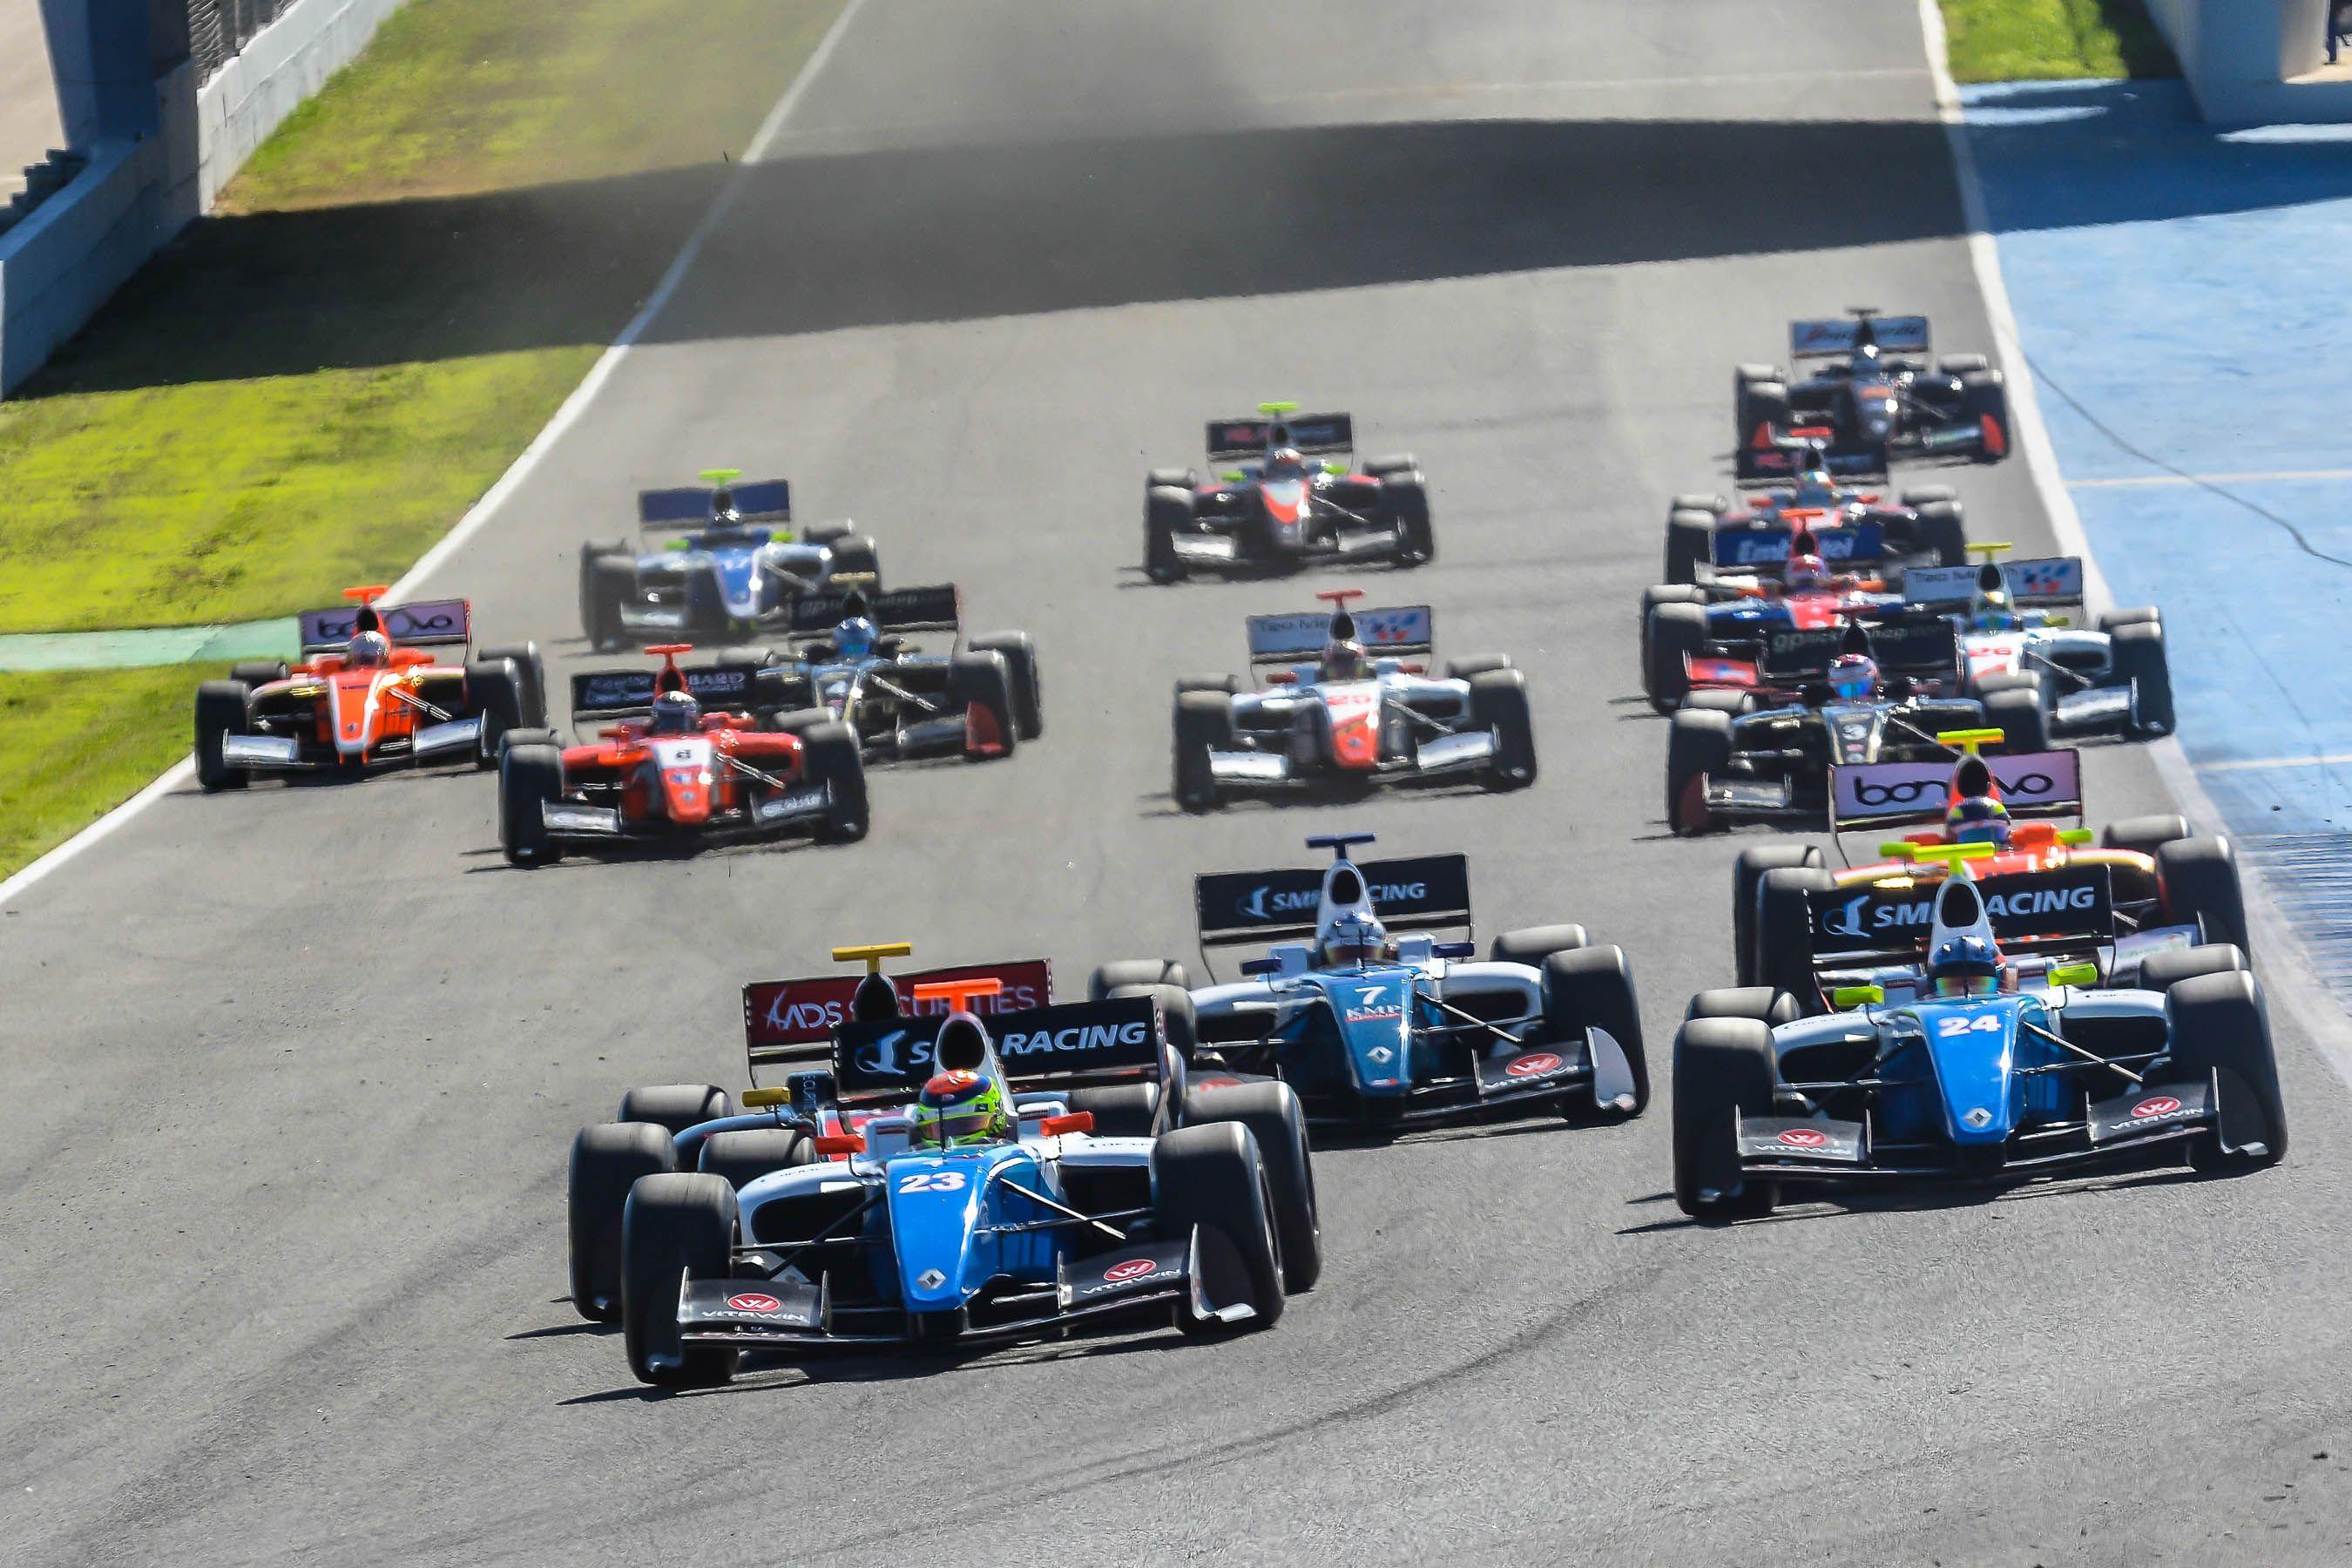 Salida de Fórmula V8 | Christian Cantizano para MIRA Jerez